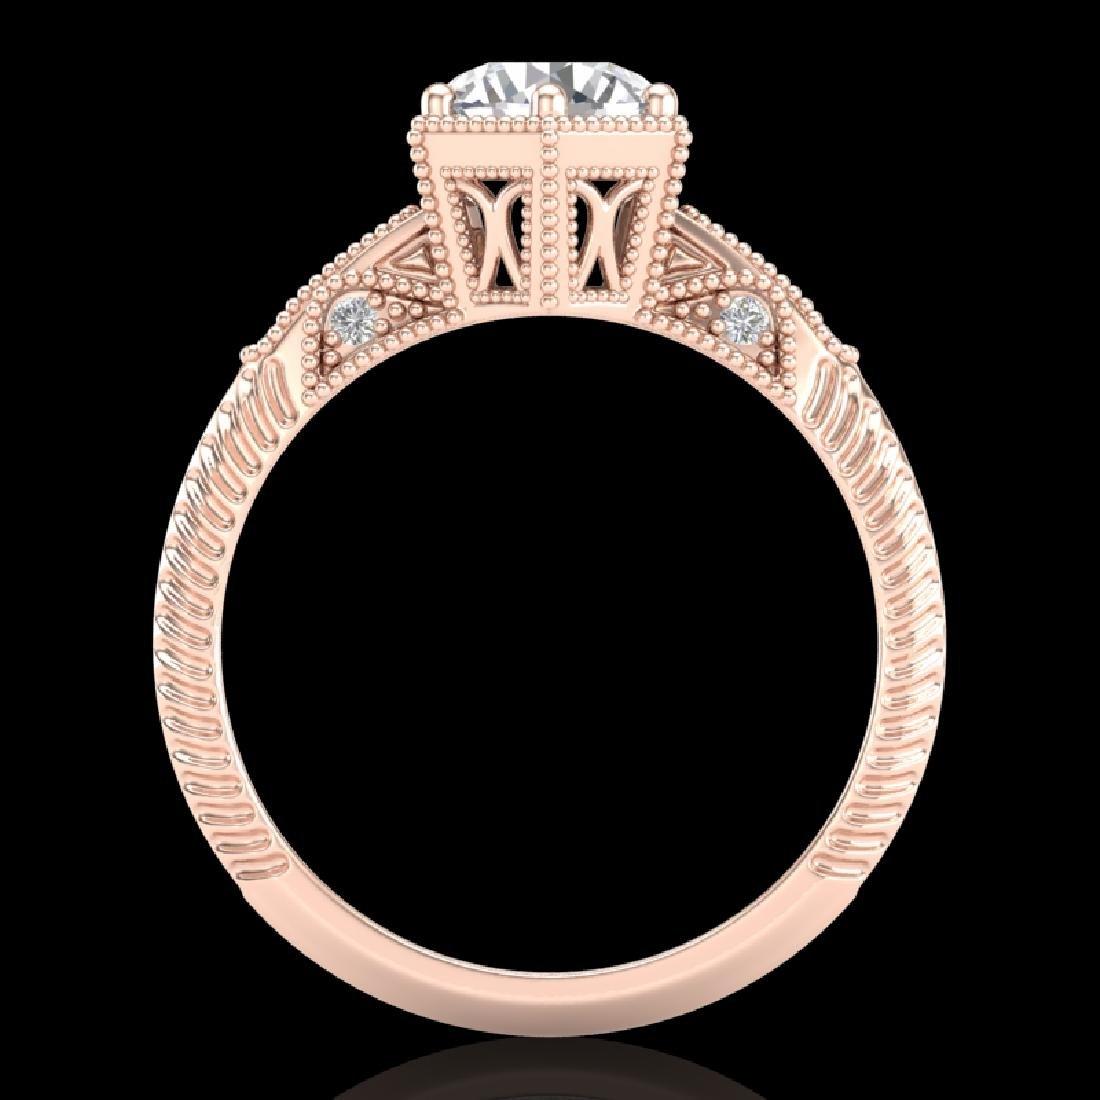 1.17 CTW VS/SI Diamond Solitaire Art Deco Ring 18K Rose